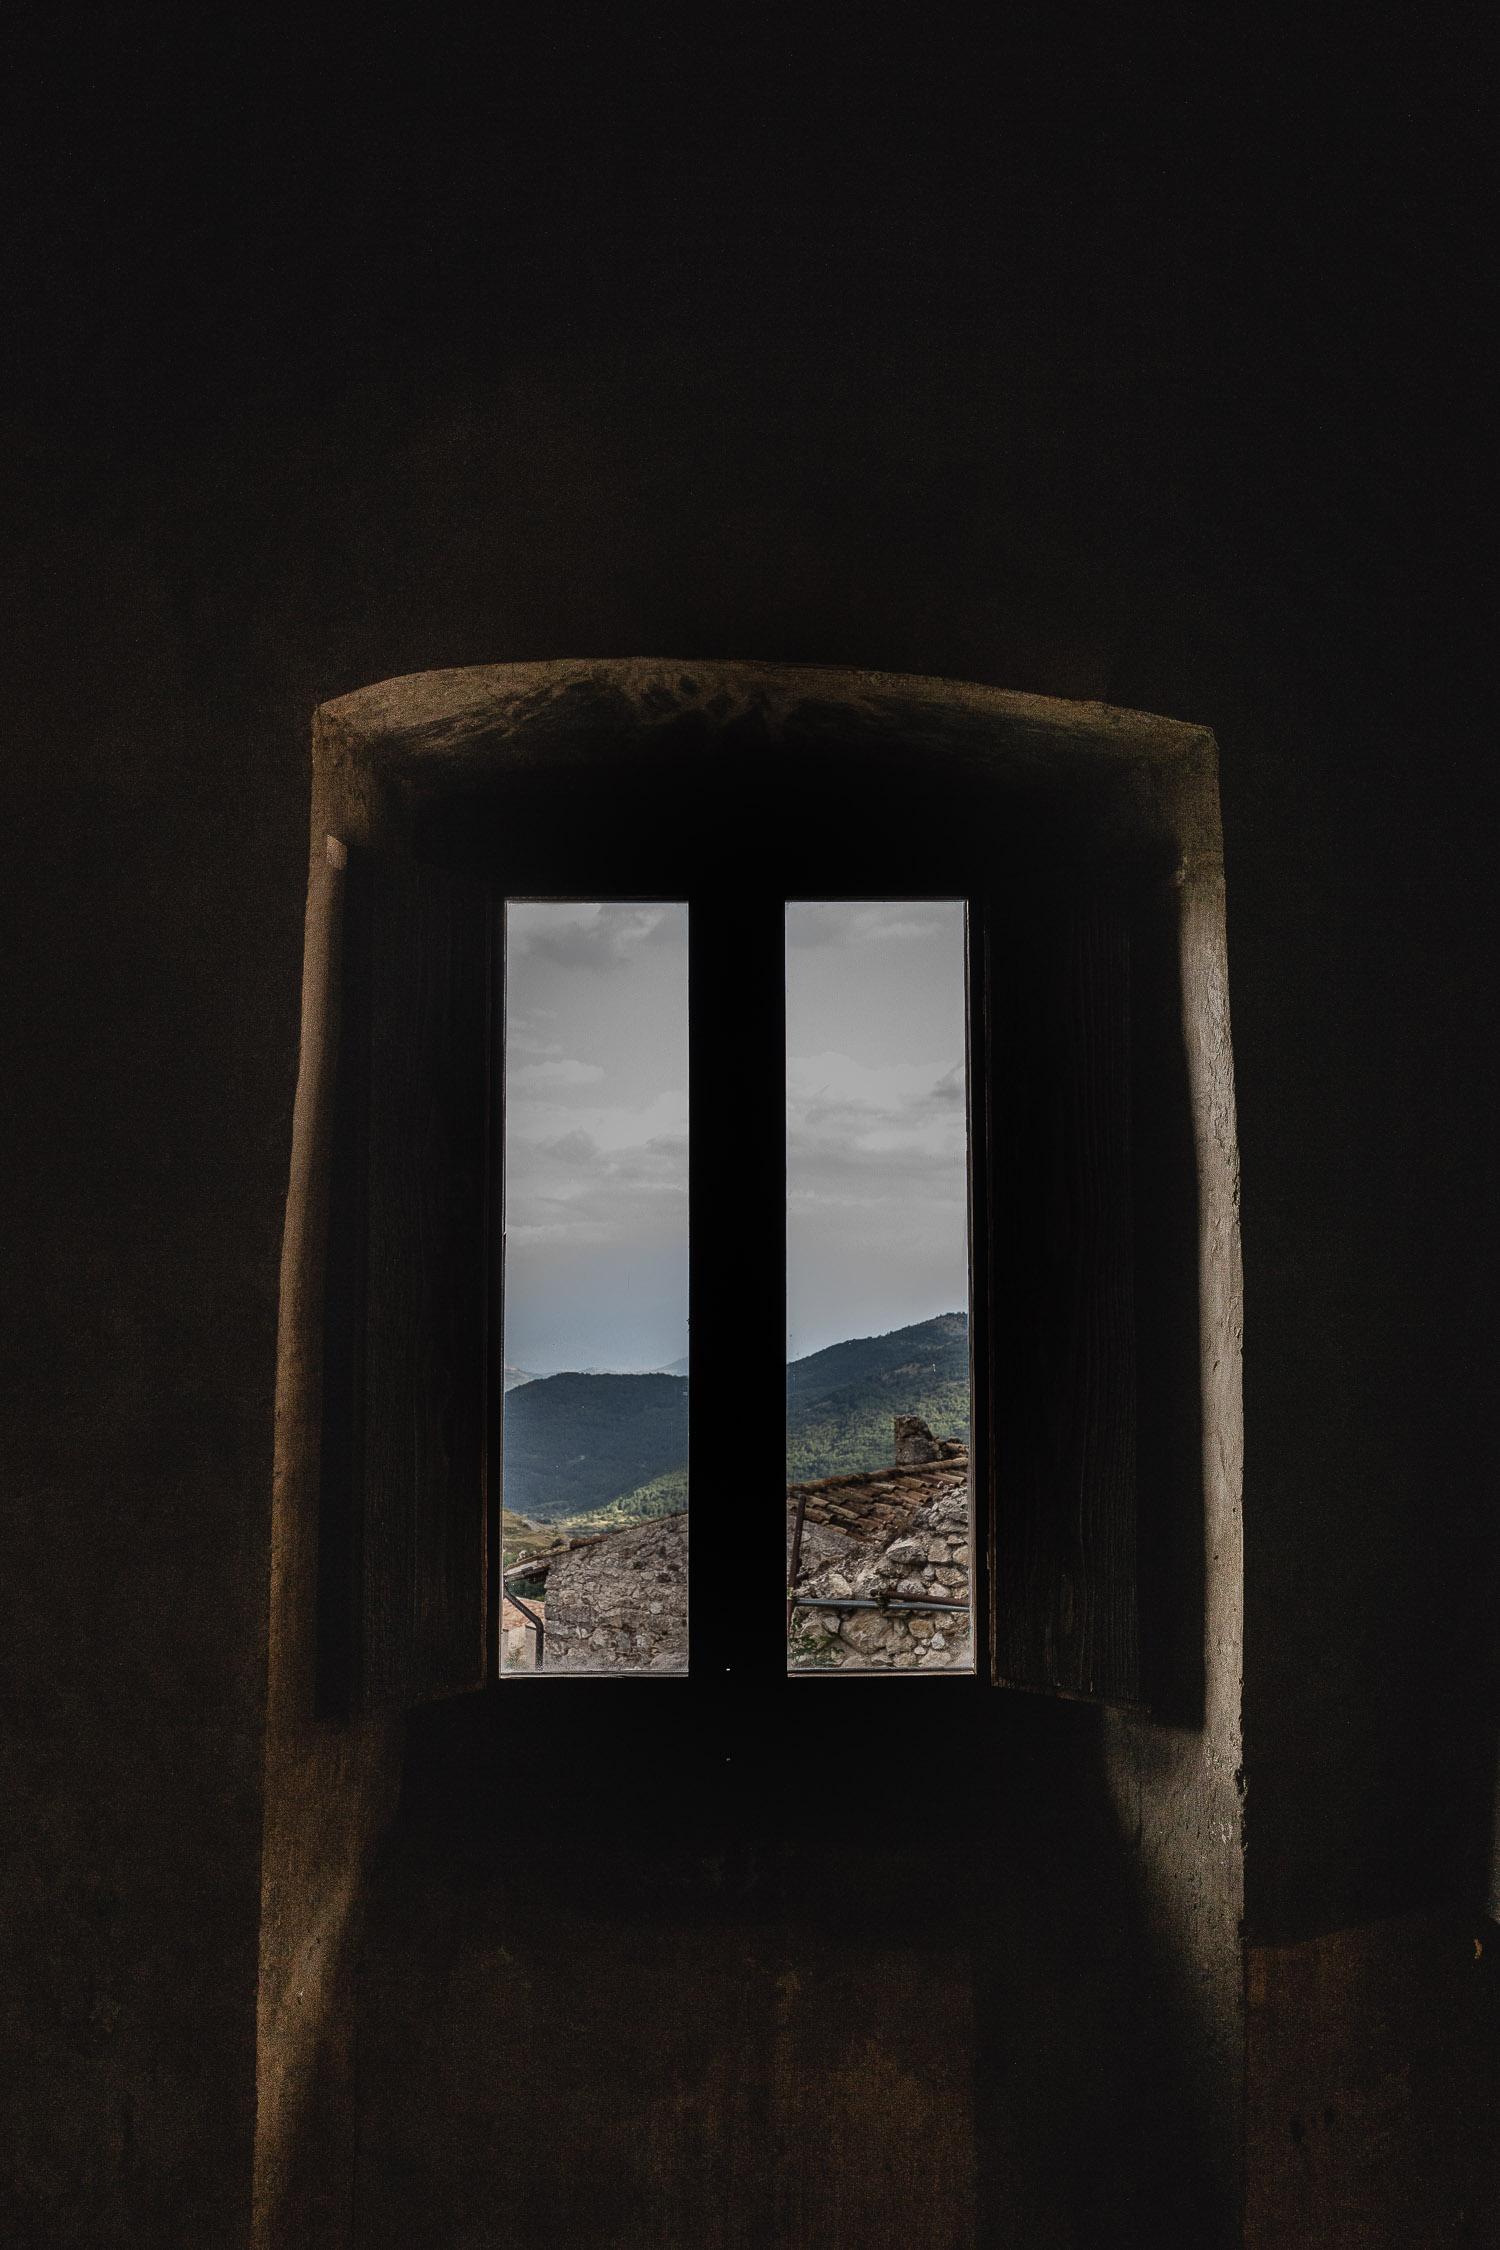 Sextantio-Albergo-Diffuso-window-Abruzzo-5537.jpg